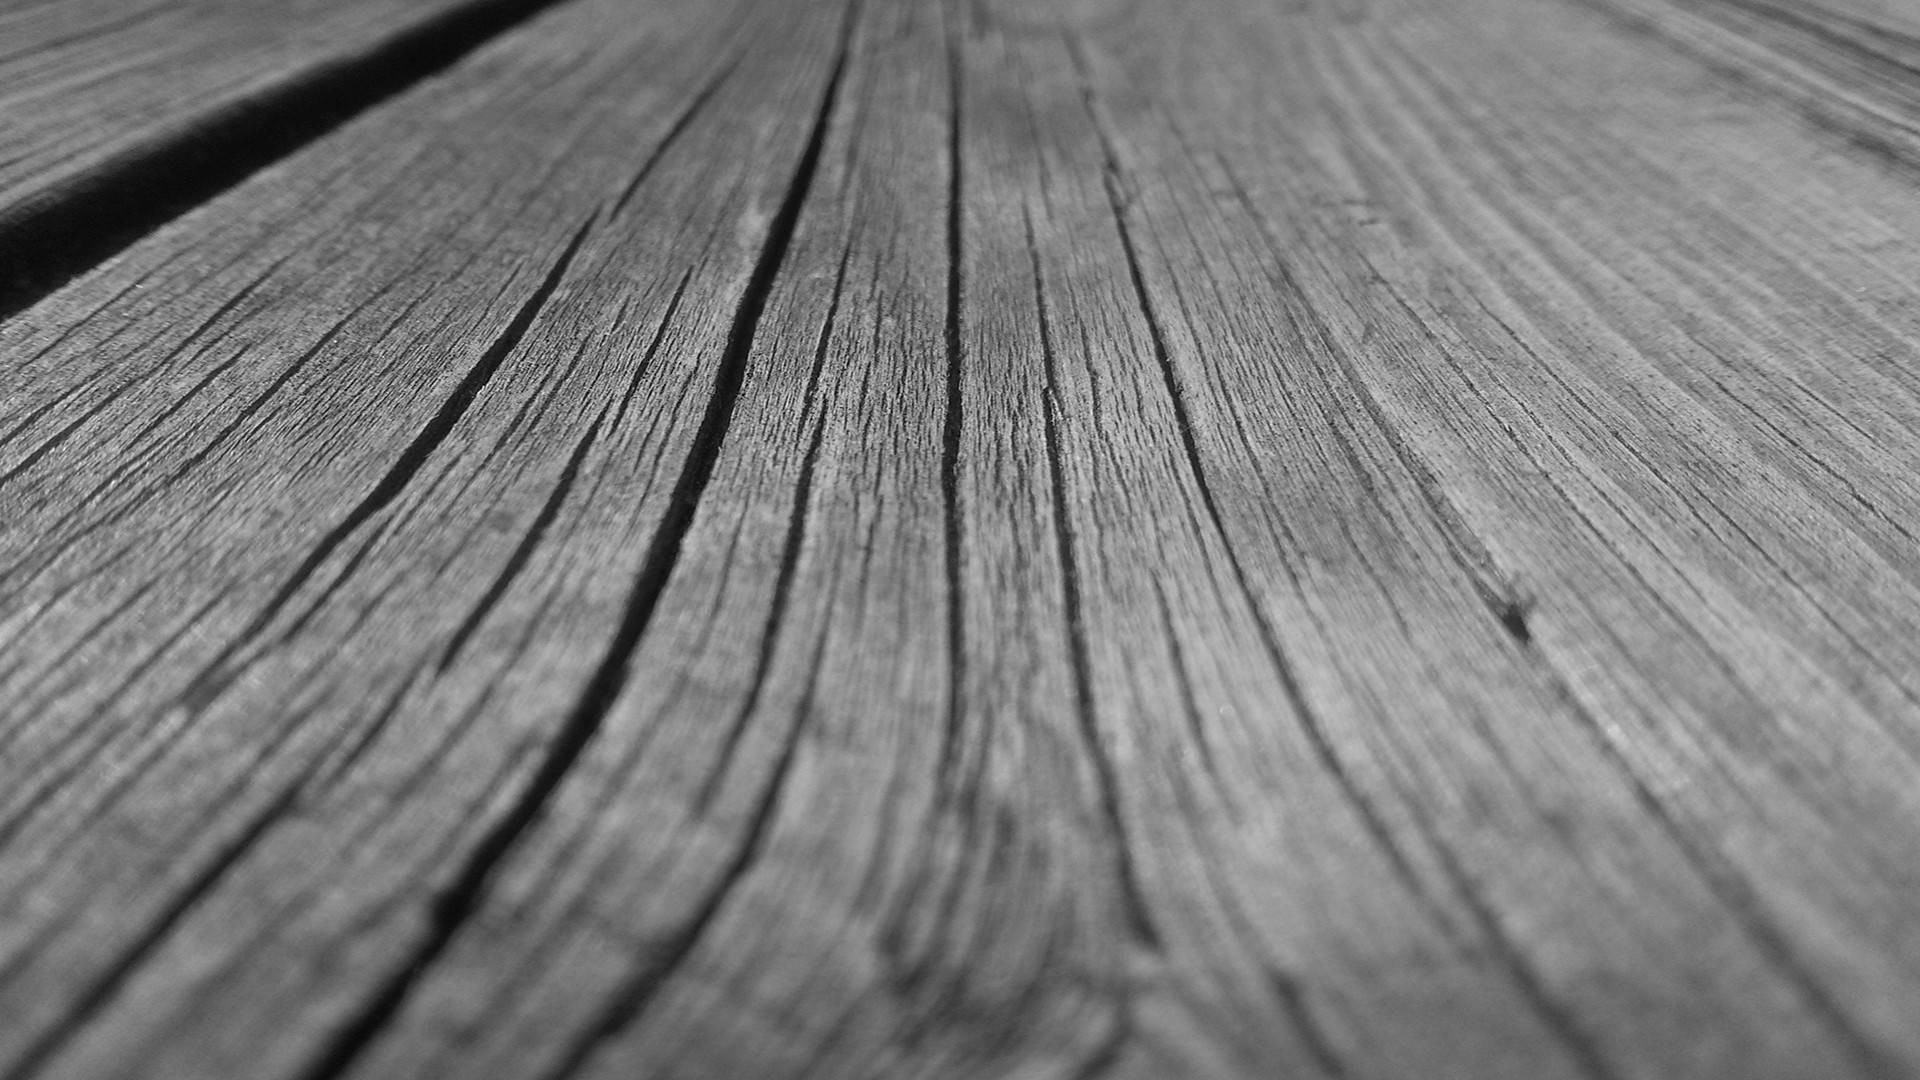 wood grain texture Wallpaper HD Resolution for Iphone, Computer .